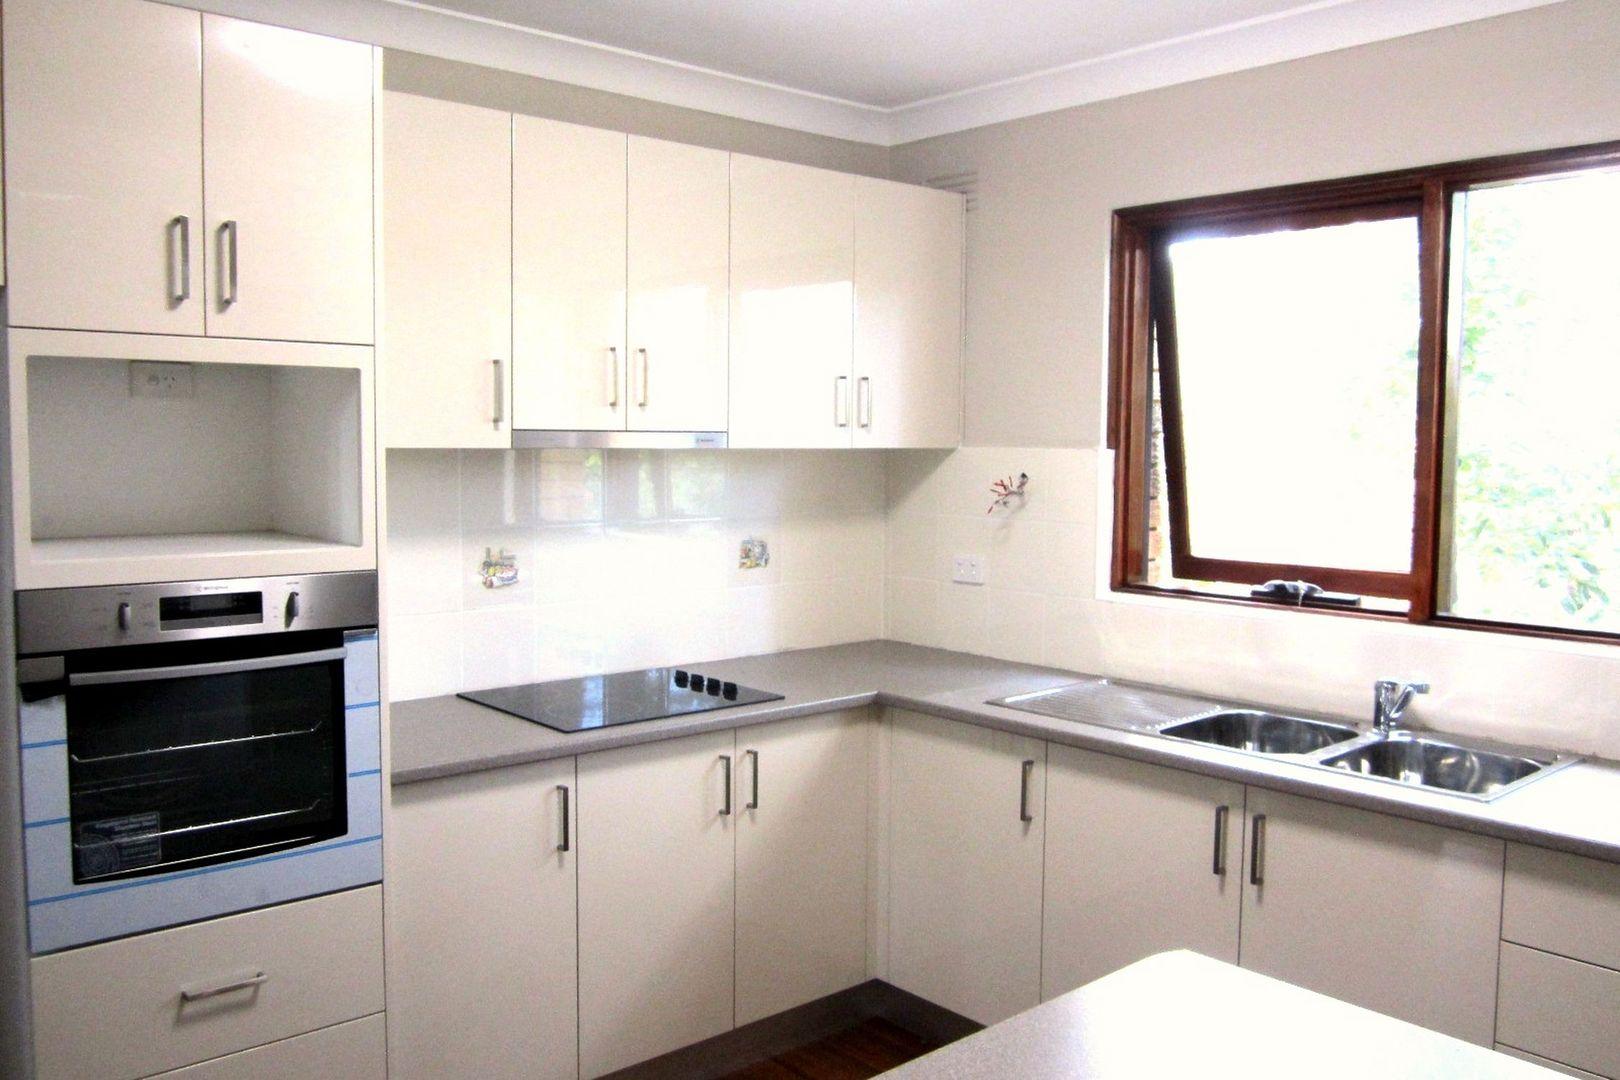 11/8-10 Morwick Street, Strathfield NSW 2135, Image 1